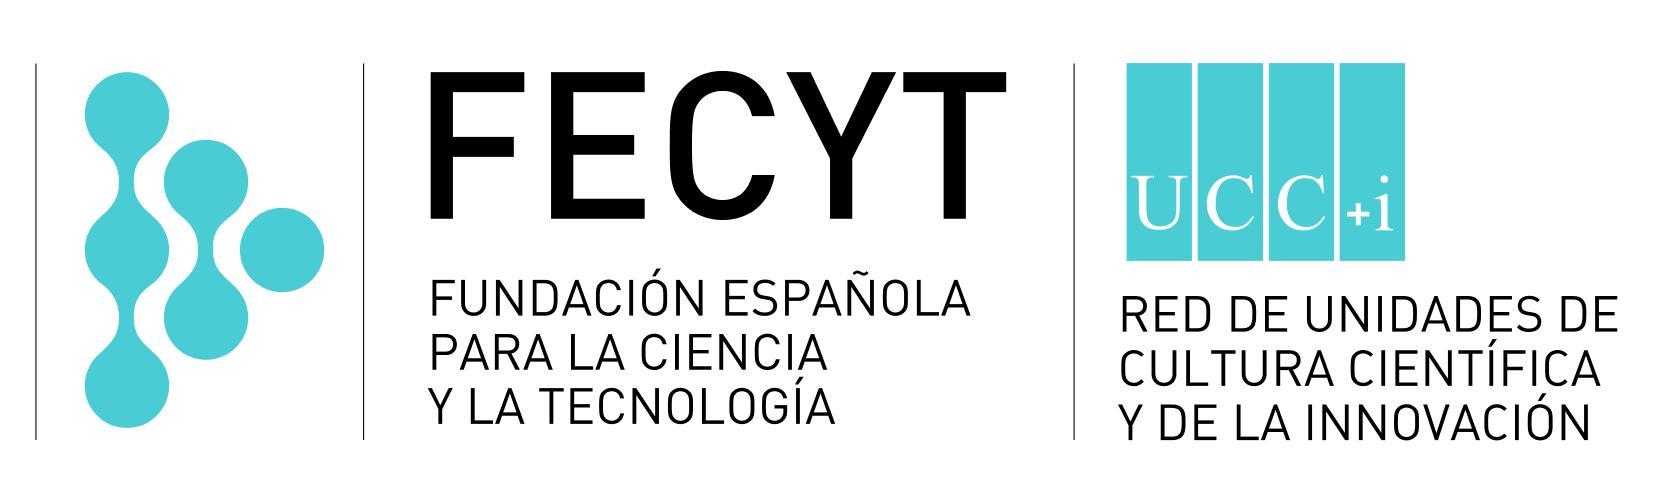 logo ucc